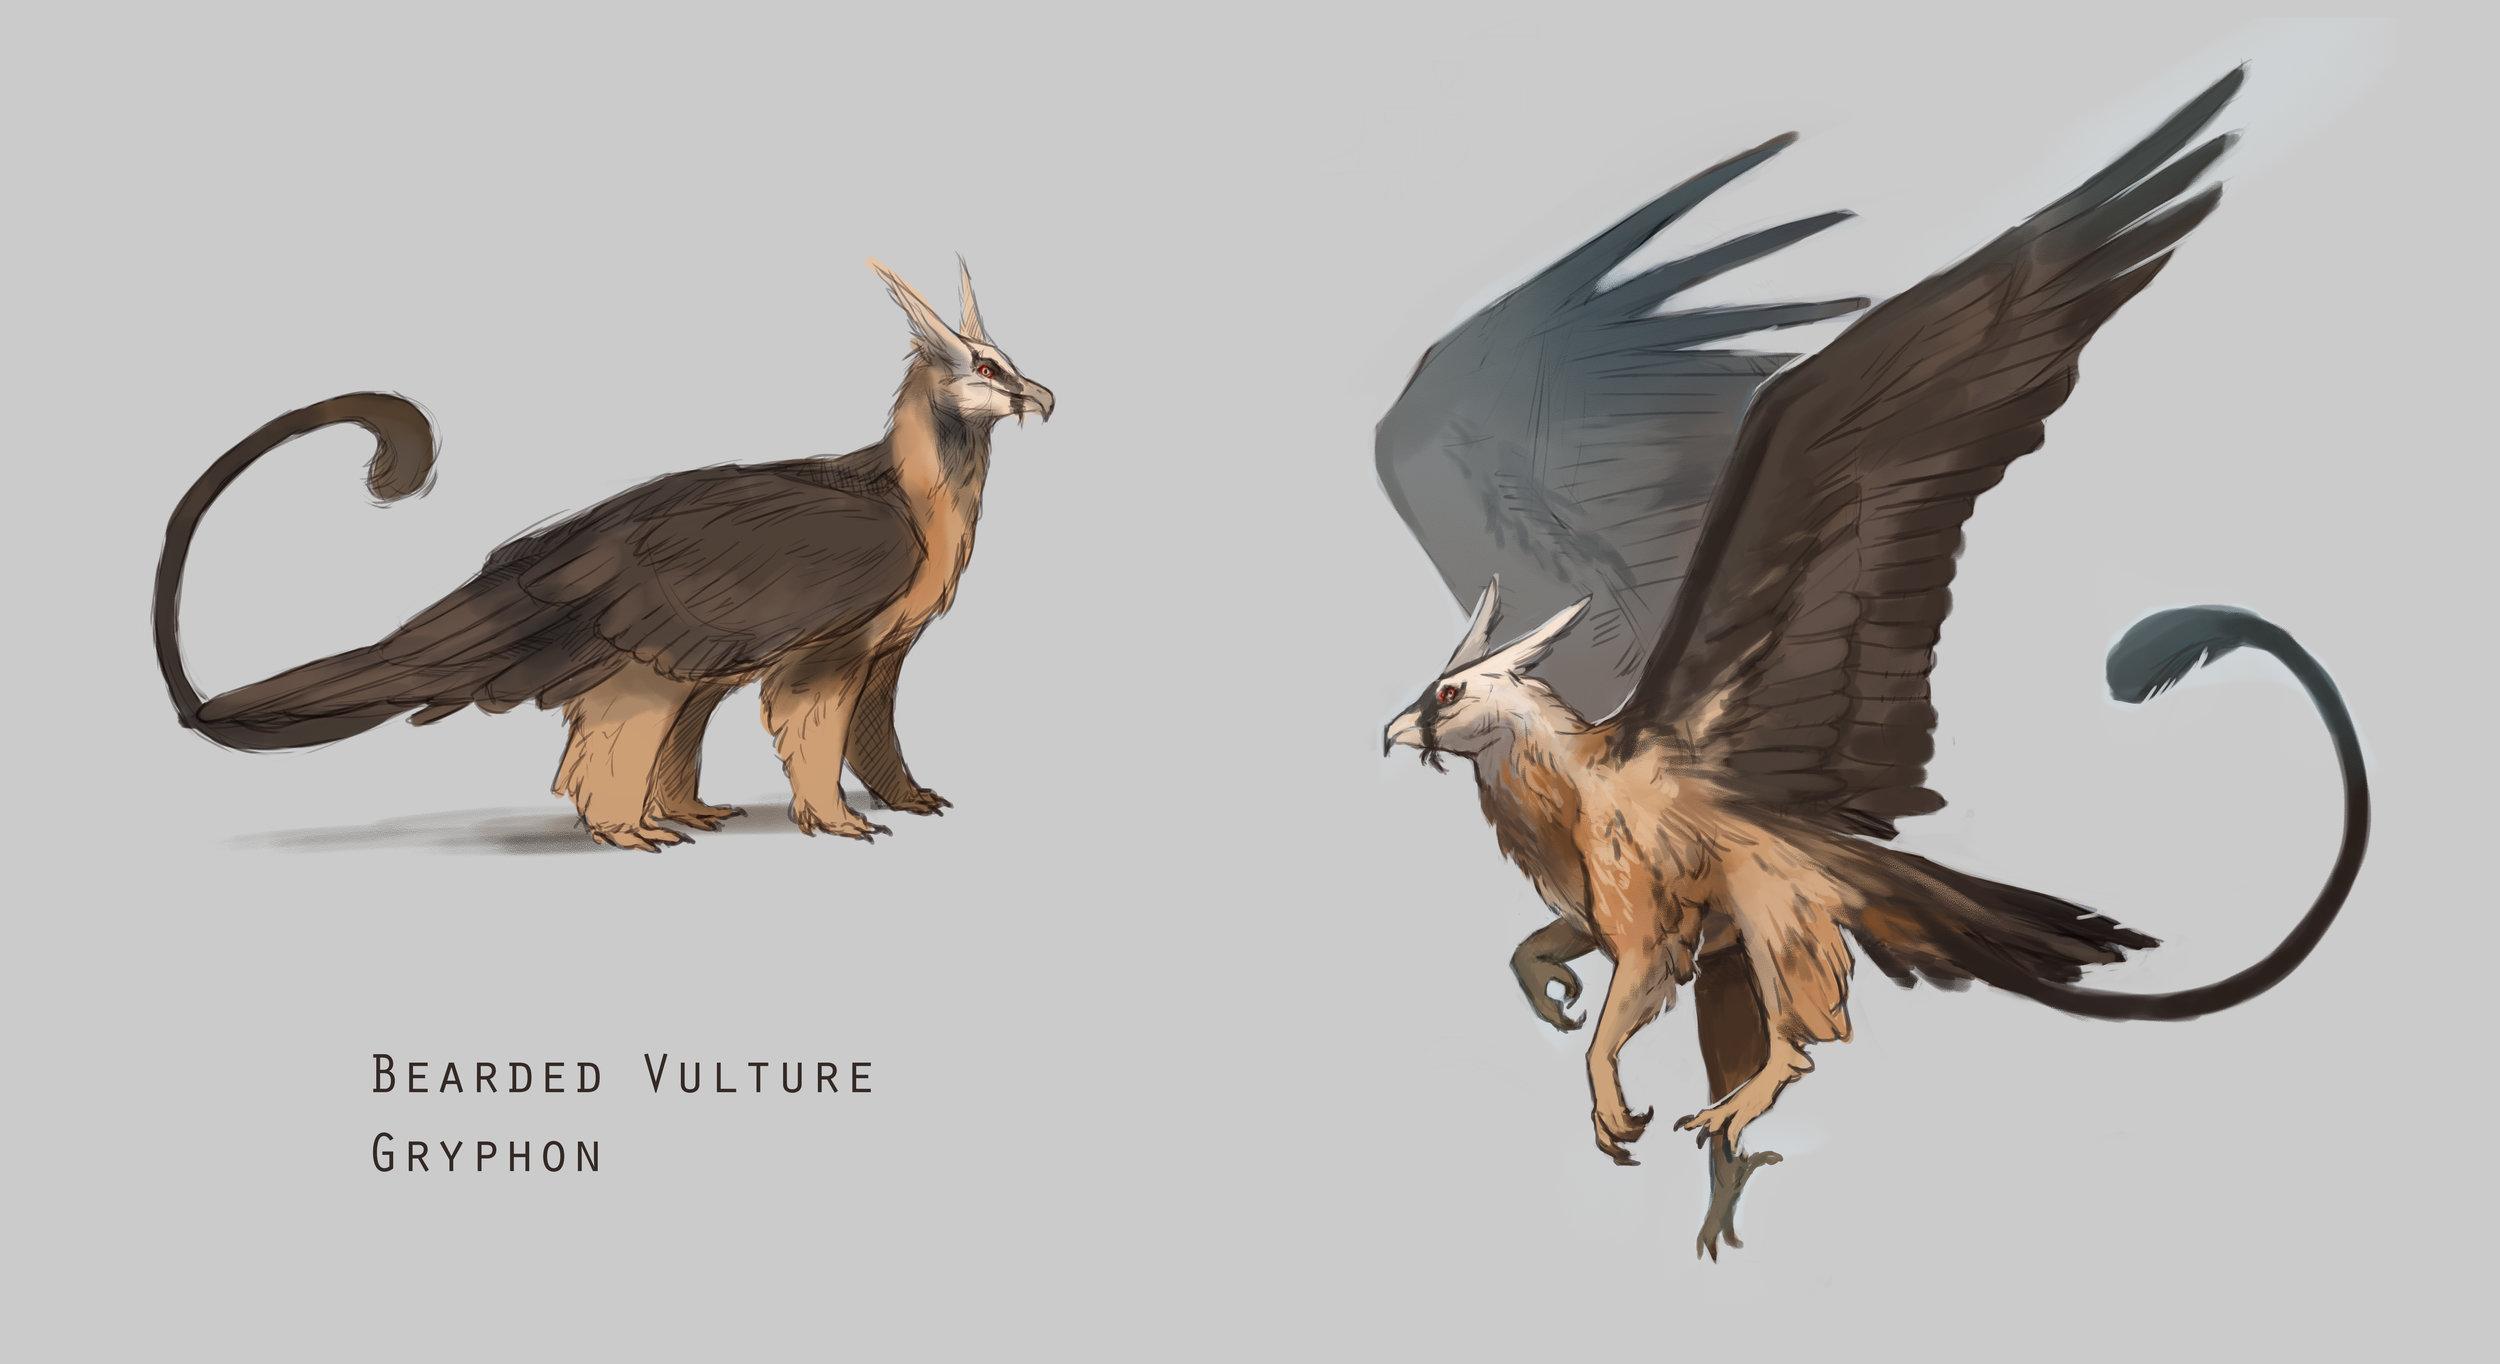 bearded vulture gryphon 2-2.jpg